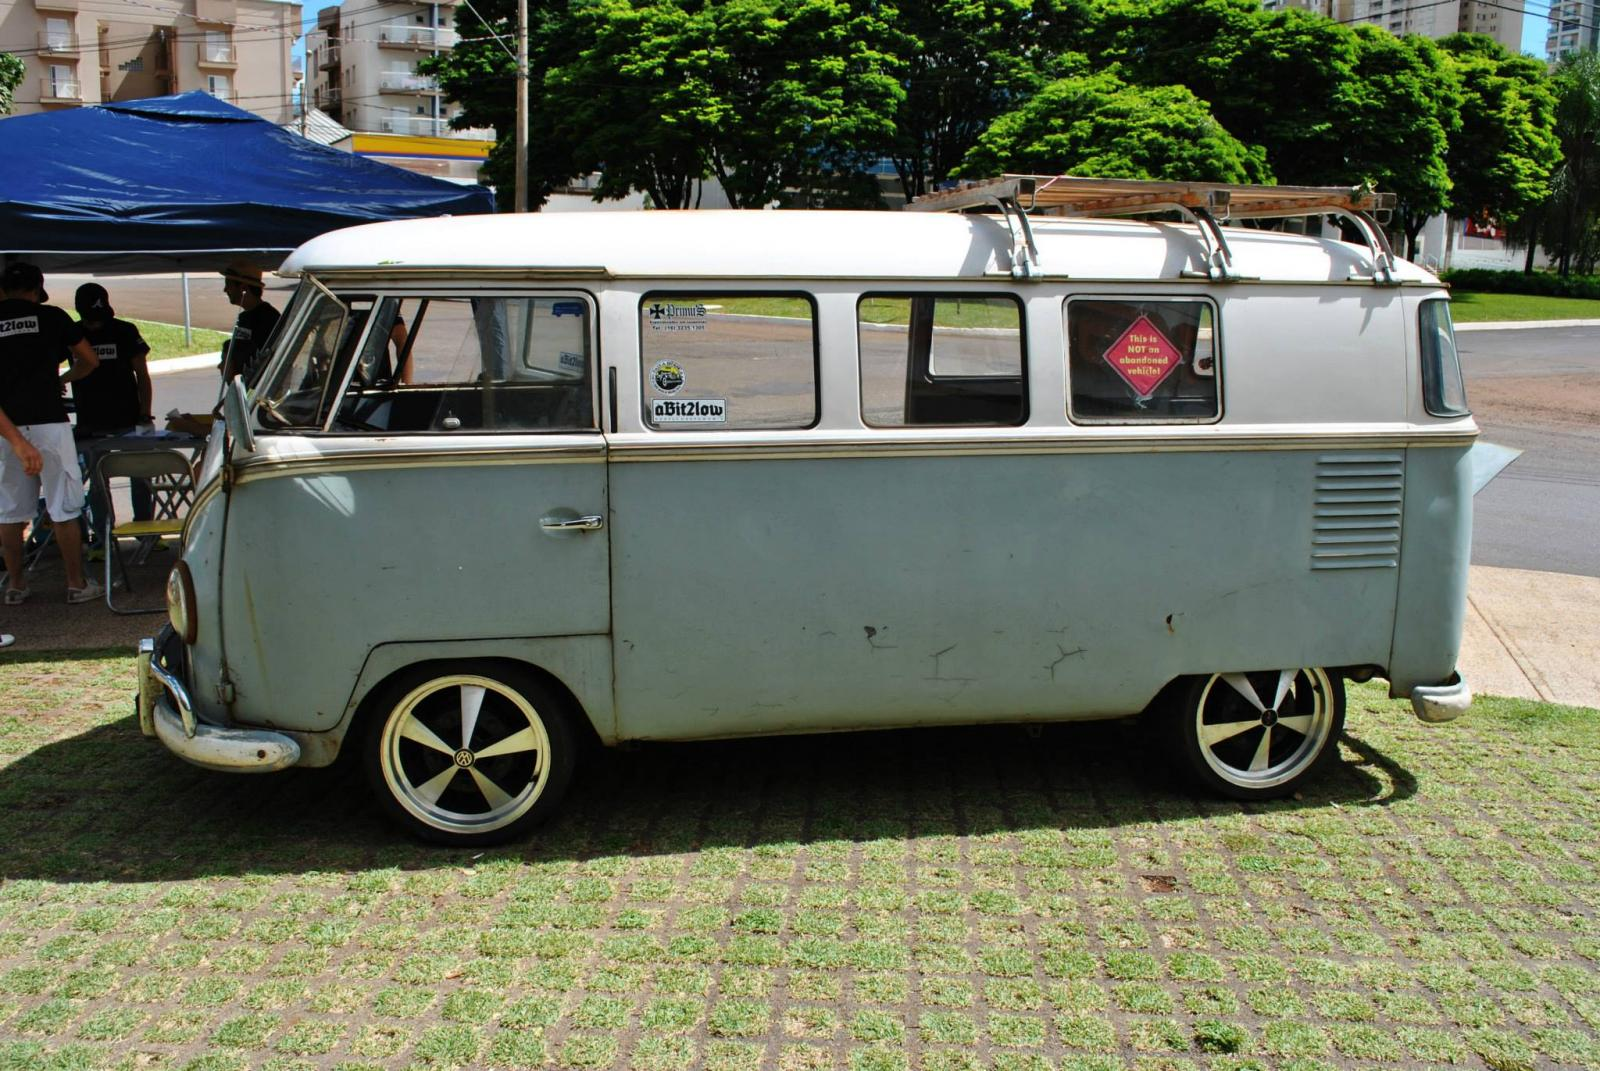 VW Kombi 1960, last year semaphore bus in Brazil